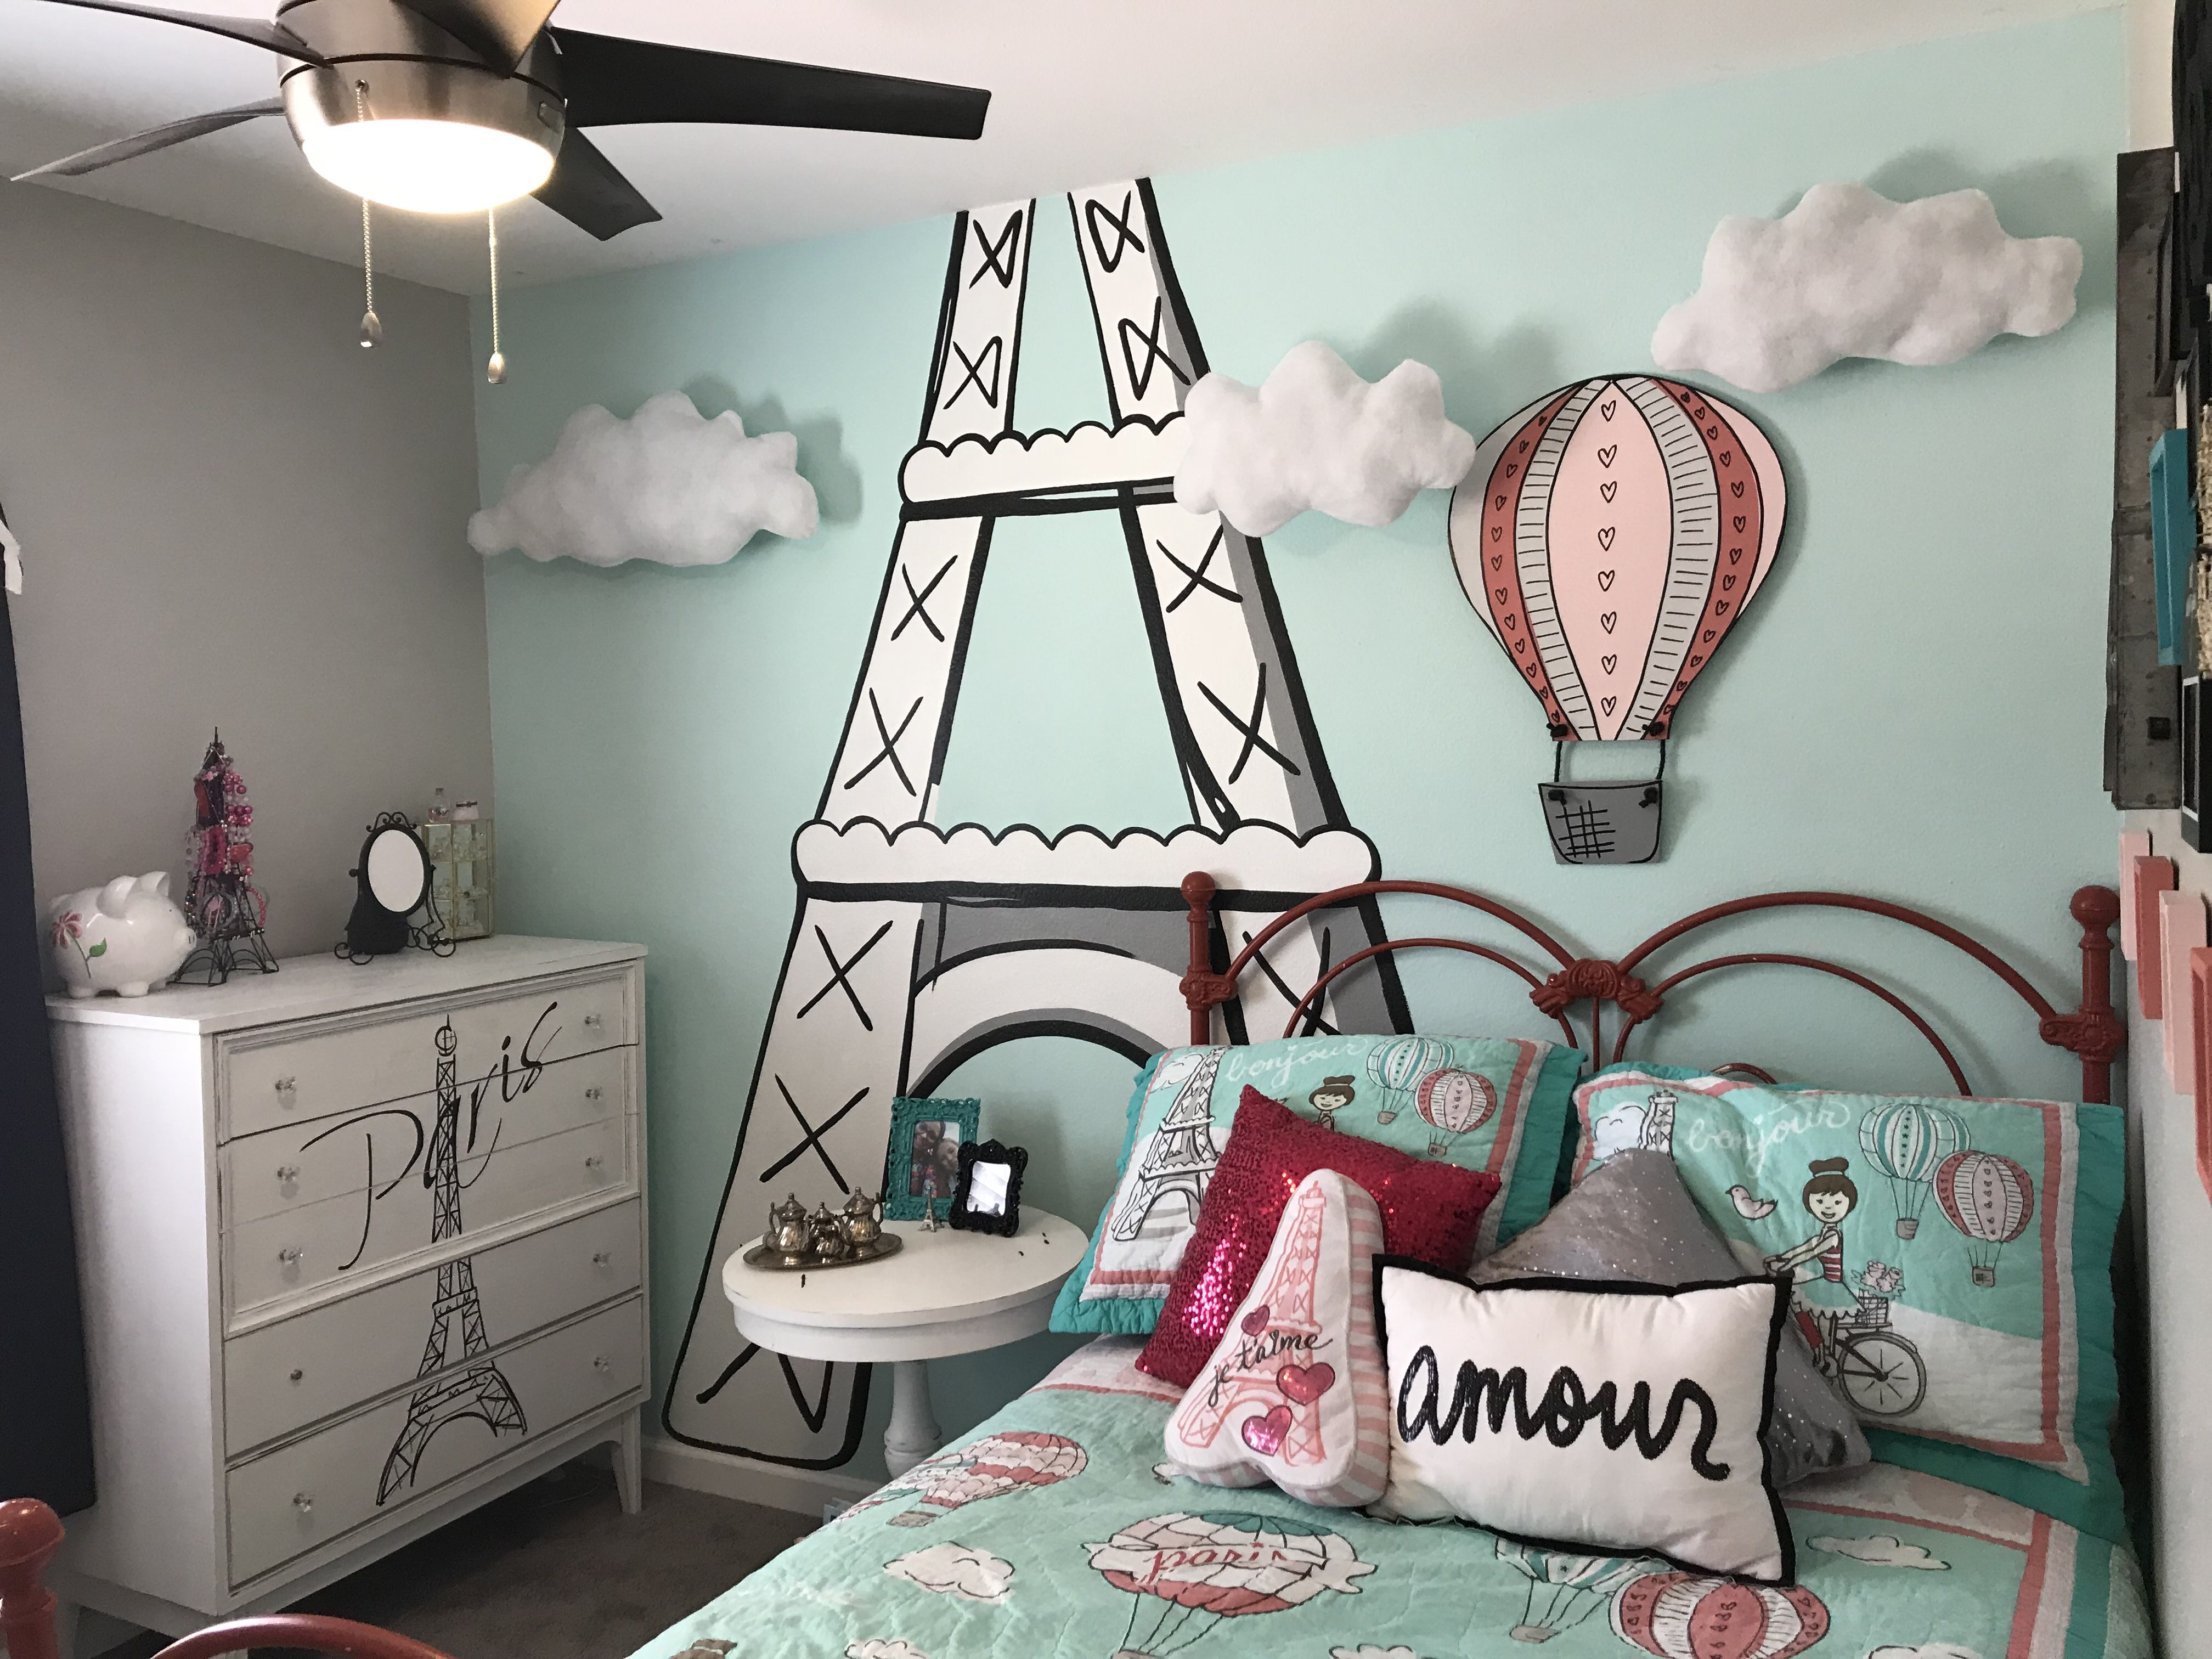 Excellent Paris Themed Bedroom 39 For Furniture Home Design Ideas With Paris Themed Bedroom Paris Themed Bedroom Decor Paris Themed Bedroom Paris Decor Bedroom